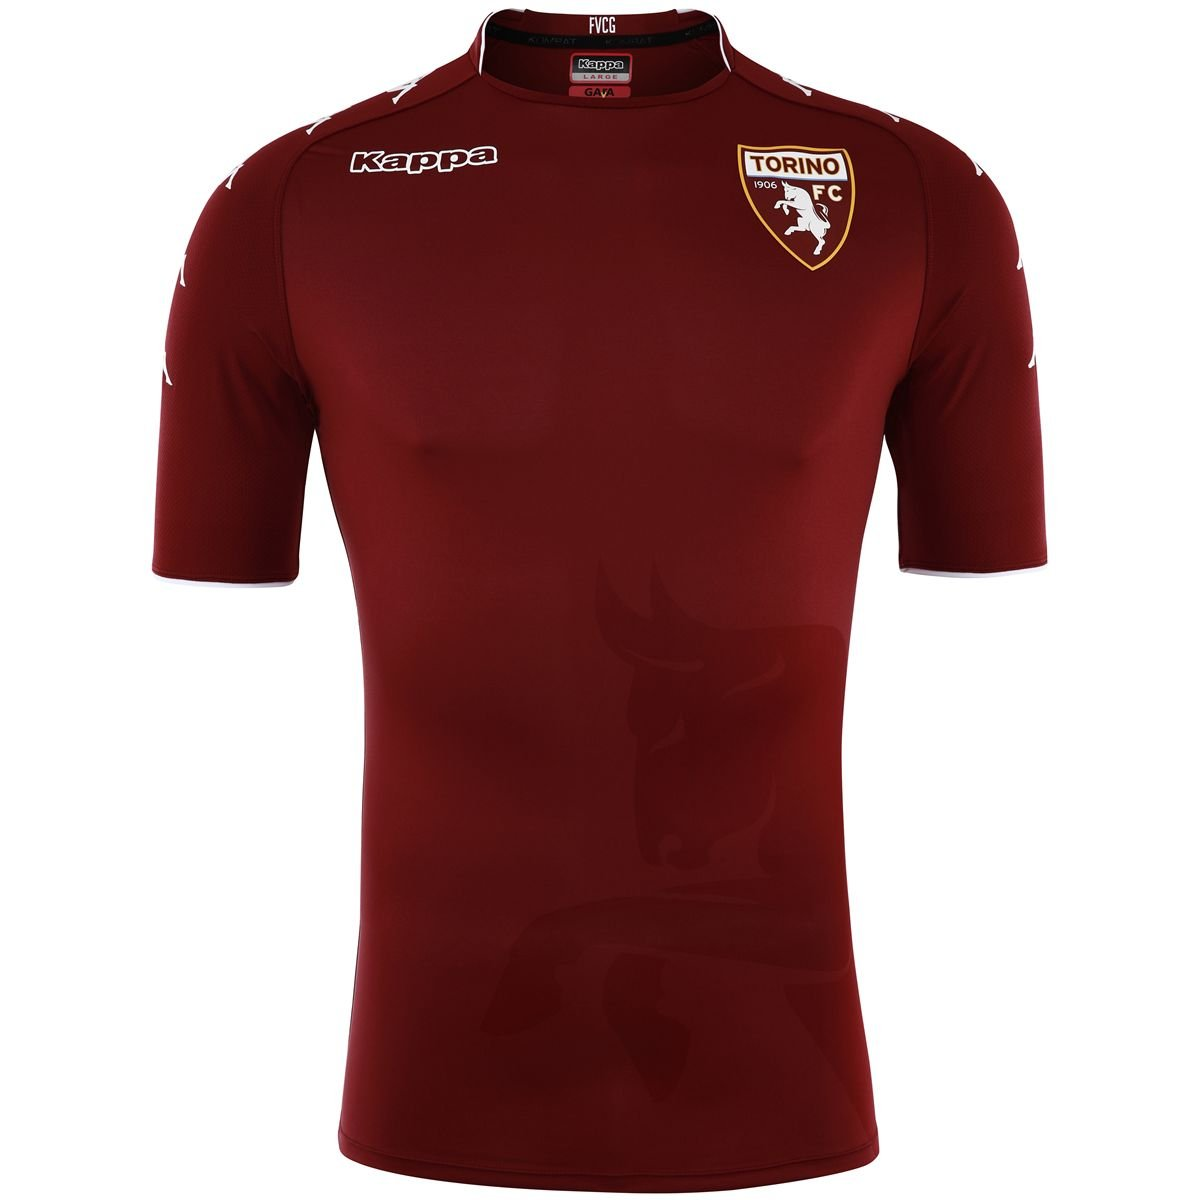 2017-2018 Torino Kappa Authentic Home Shirt B074WP9XN7Maroon XL Adults